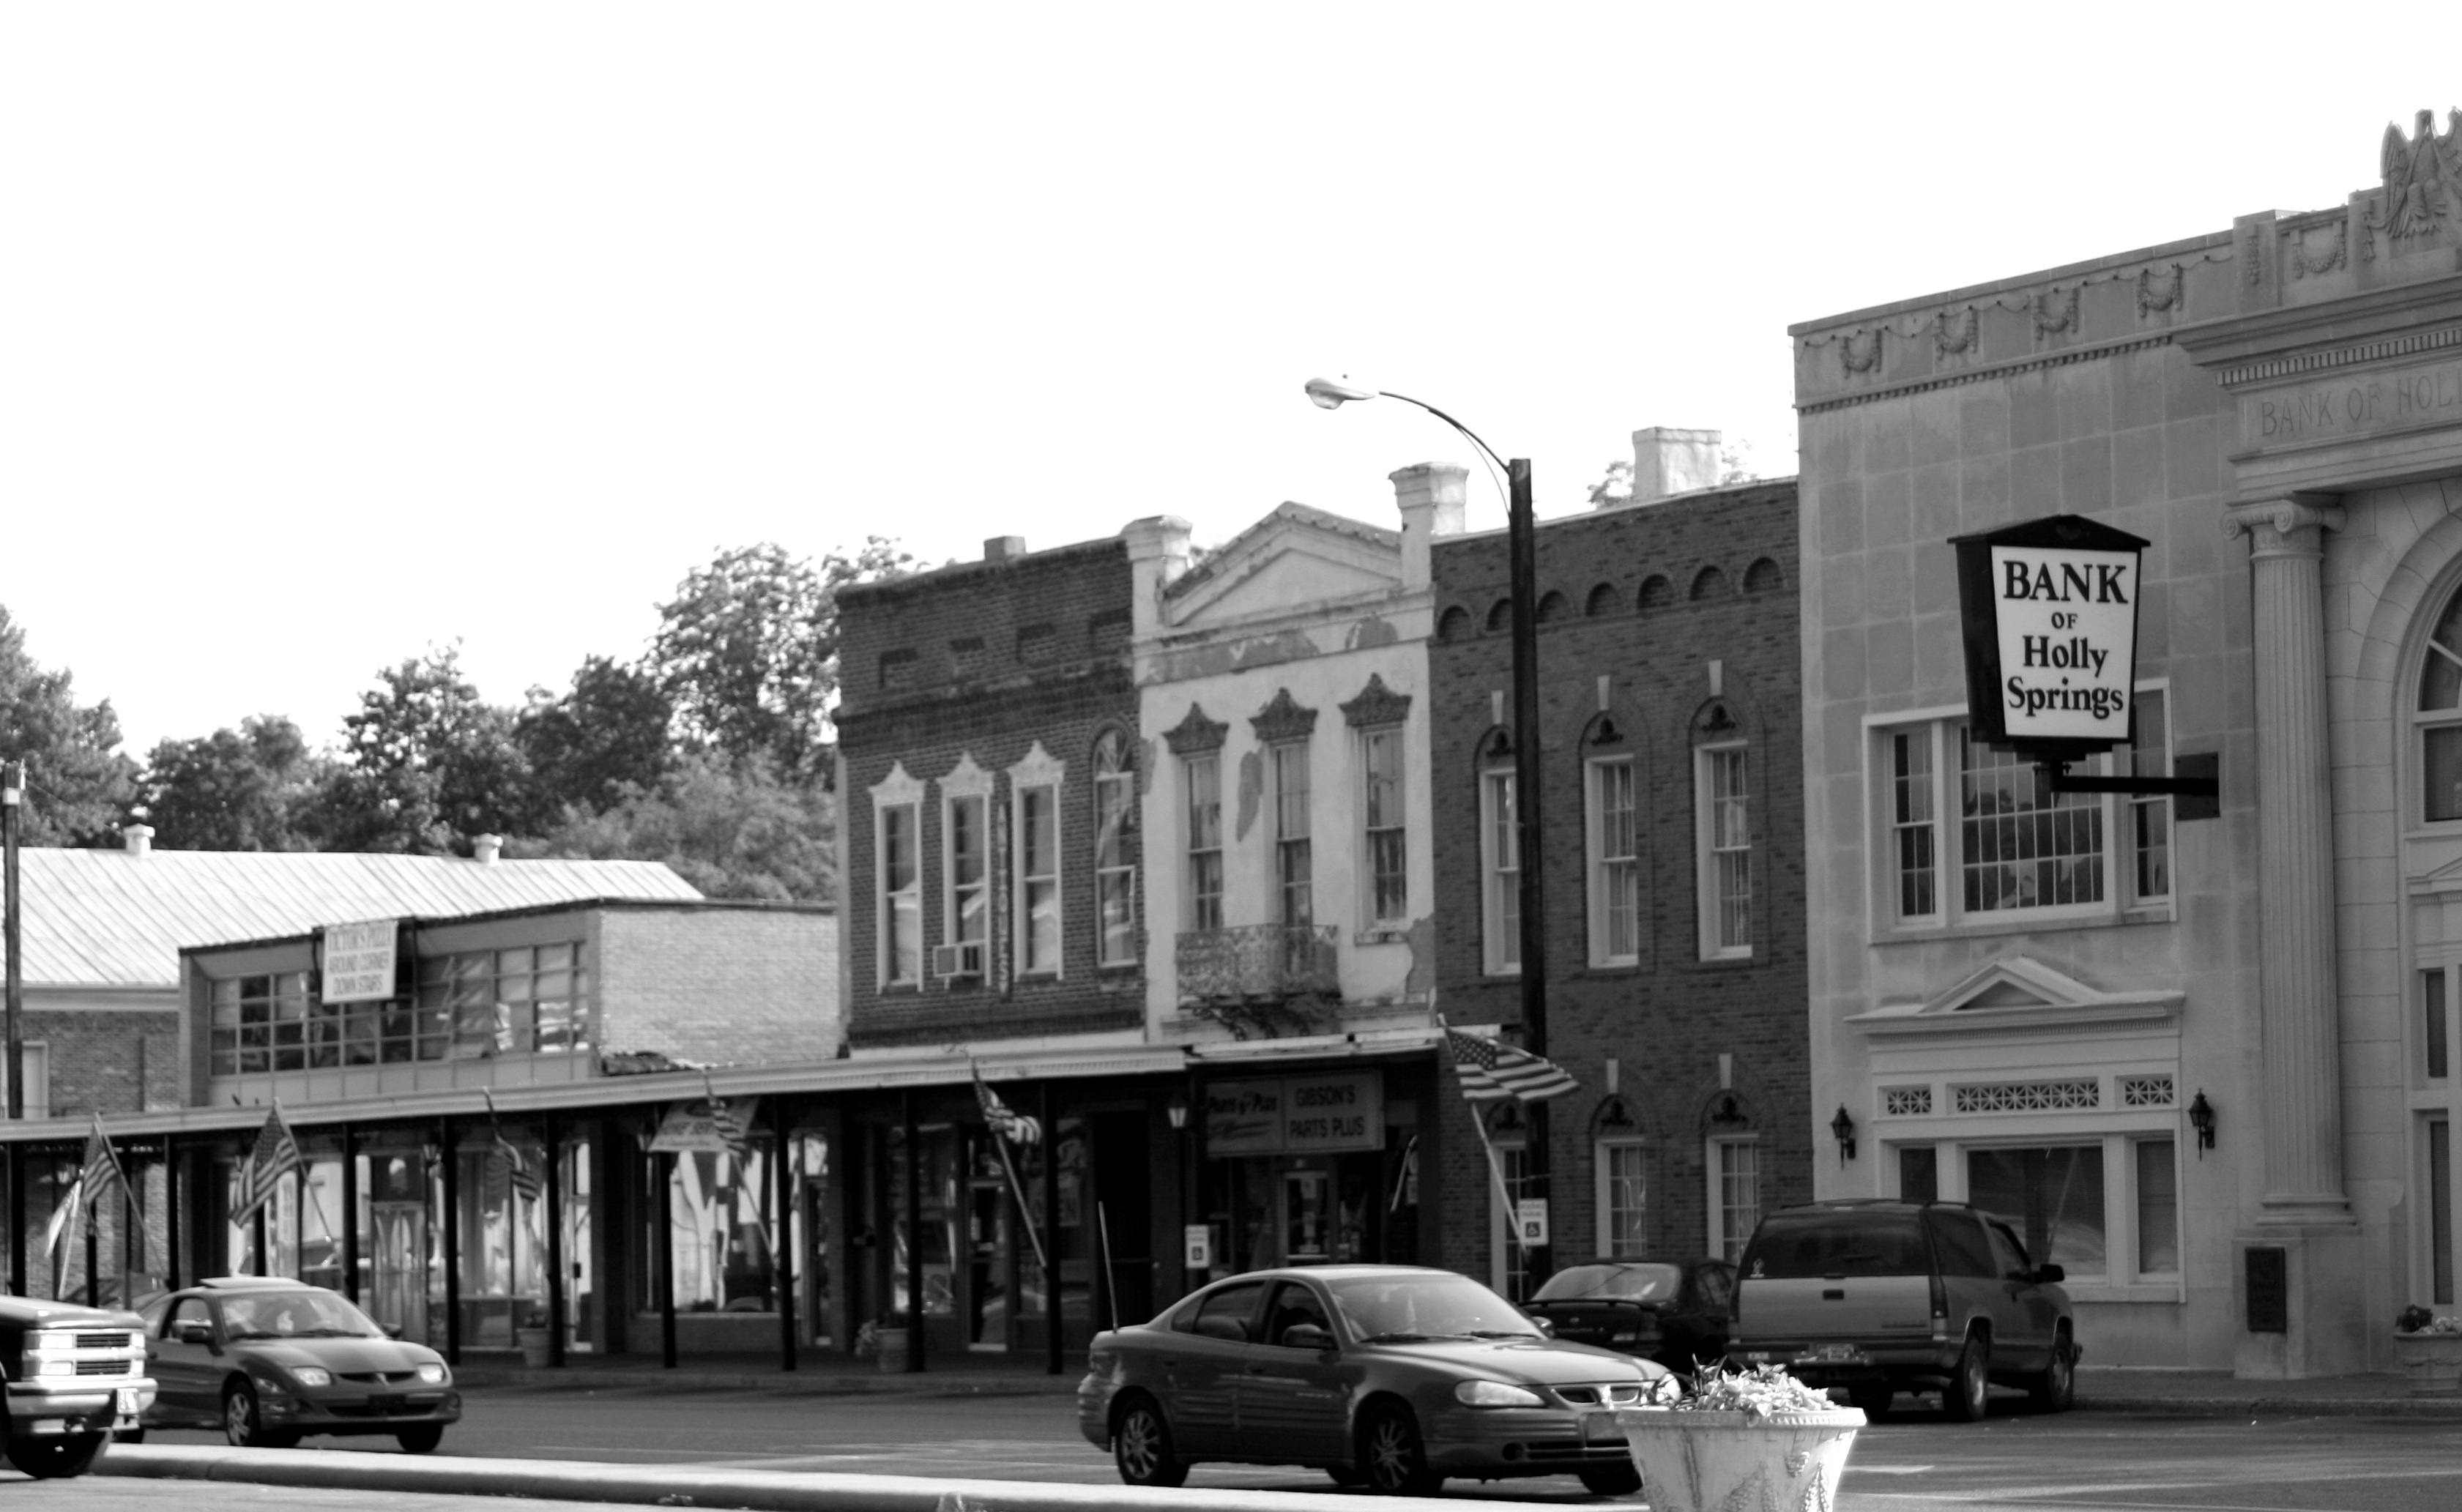 City Of Starkville City Hall